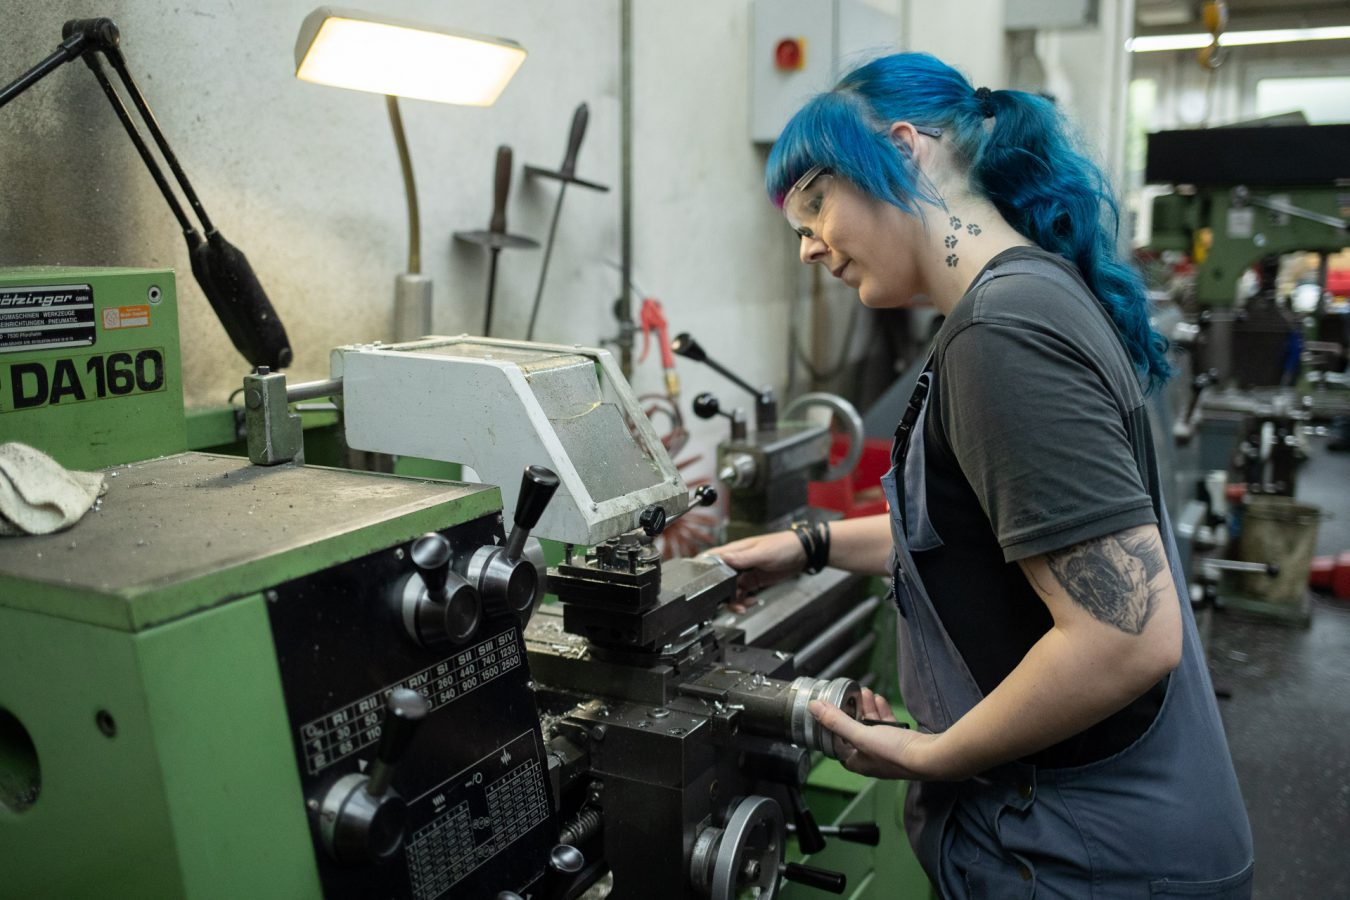 Frau bedient Maschine, Profiltech